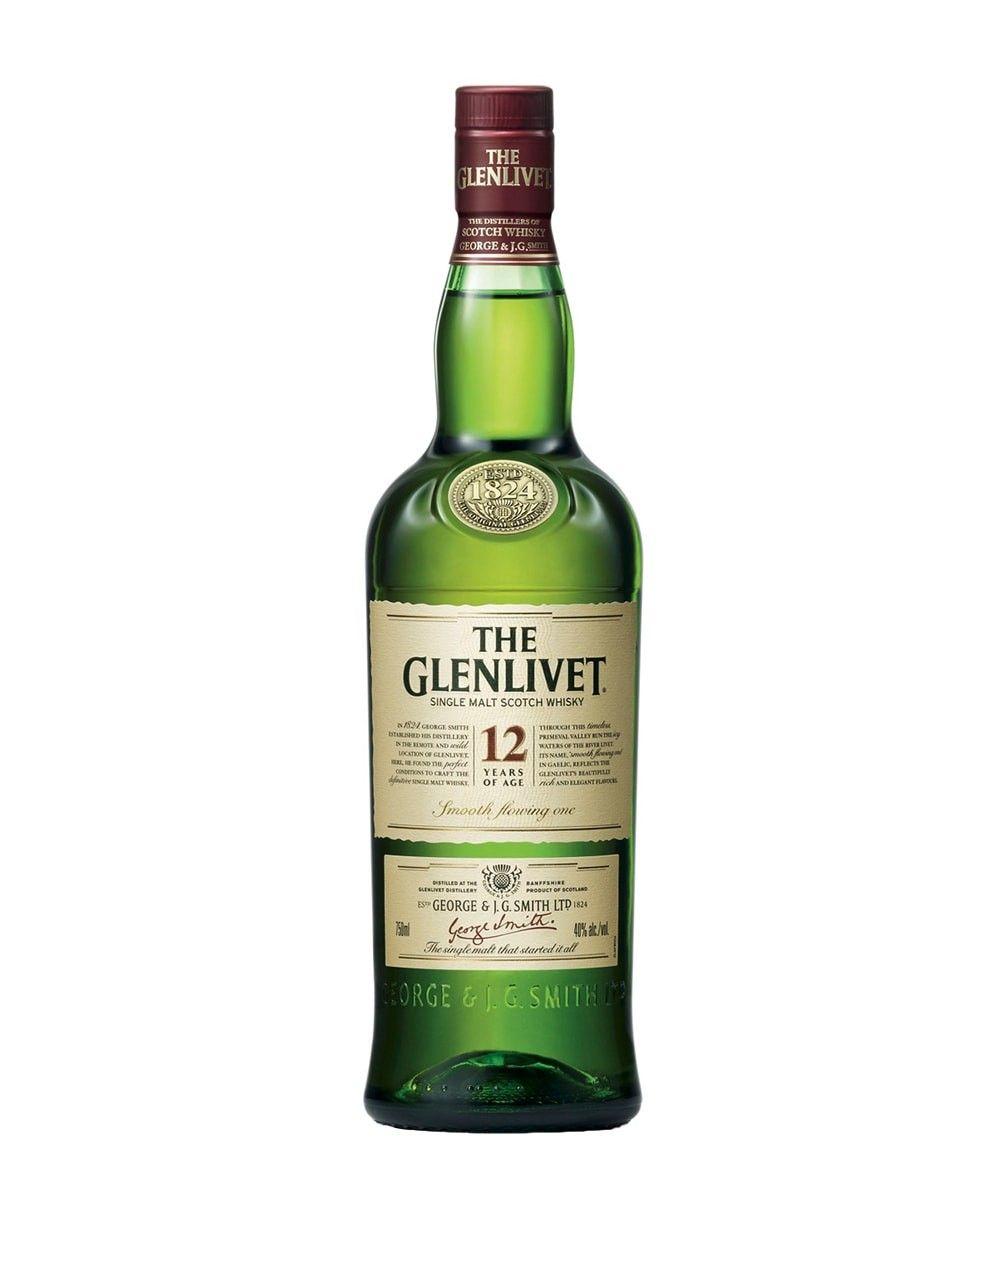 The Glenlivet 12 Year Old Scotch Whisky Buy Online Or